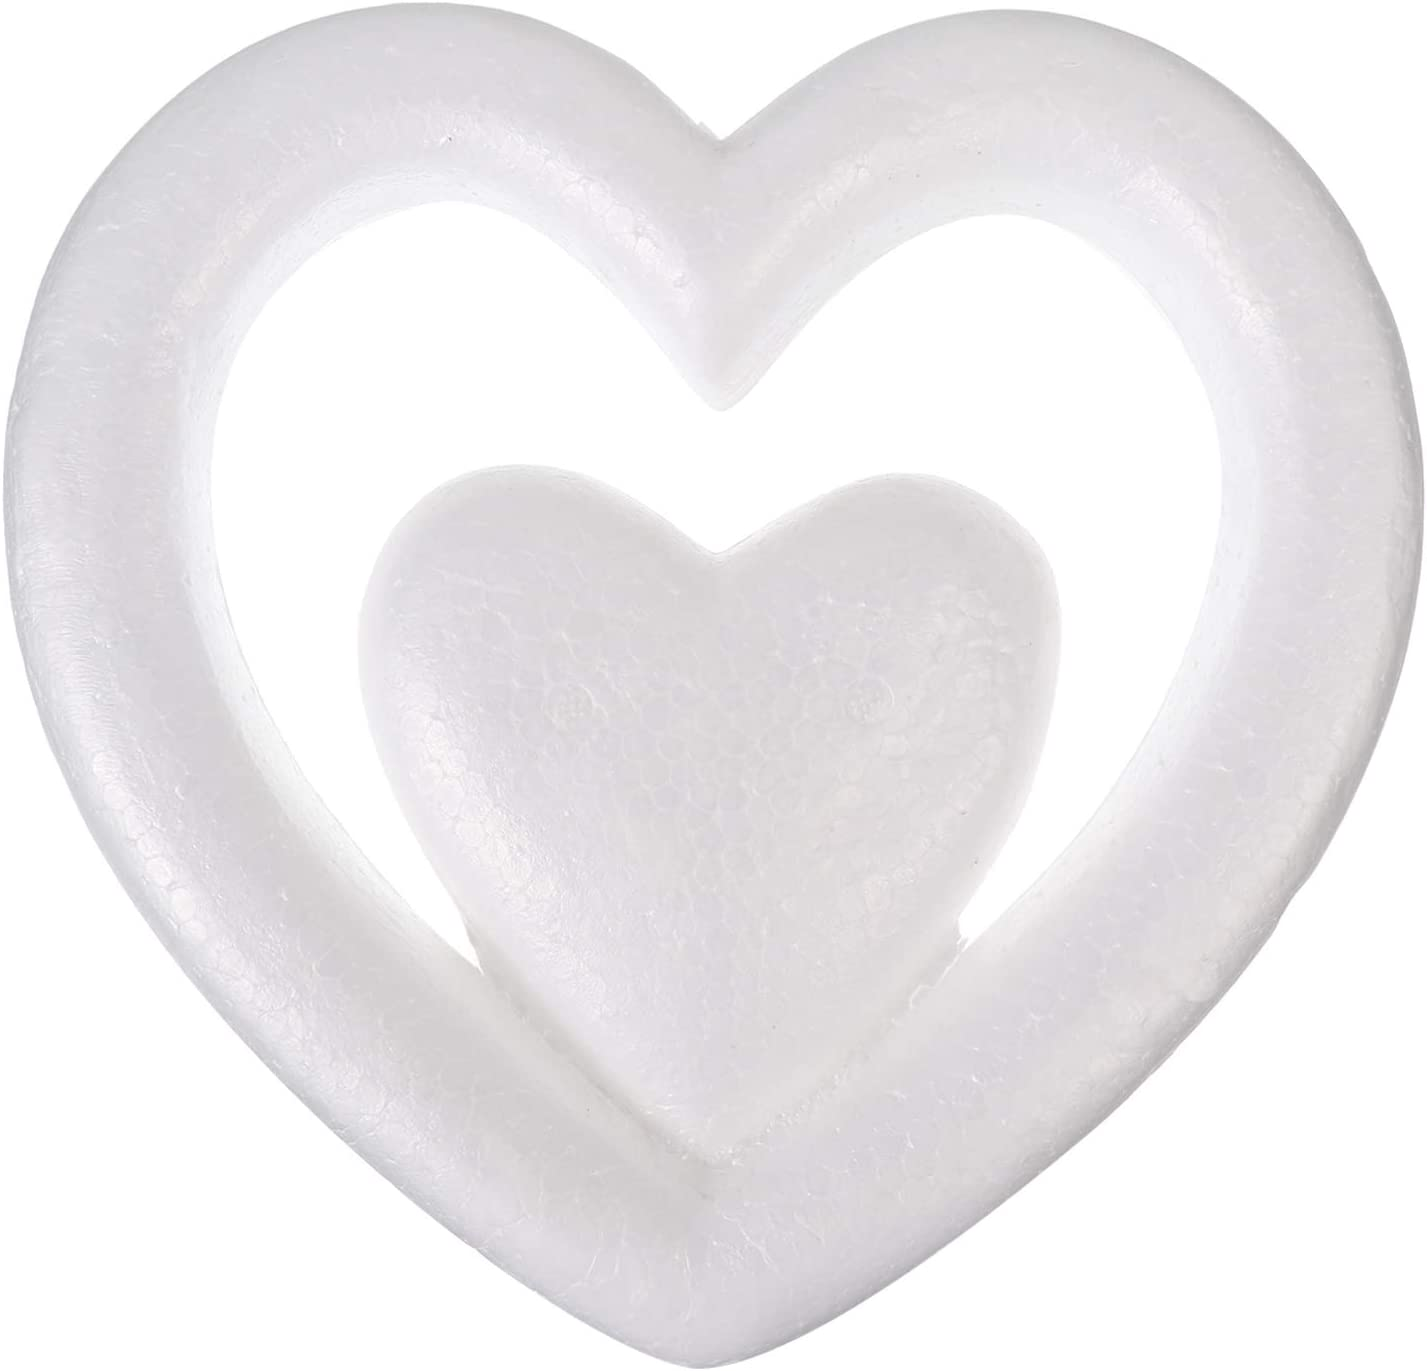 PRETYZOOM Foam Hearts 25CM Genuine Styrofoam Balls Ball 5 ☆ very popular Craft White